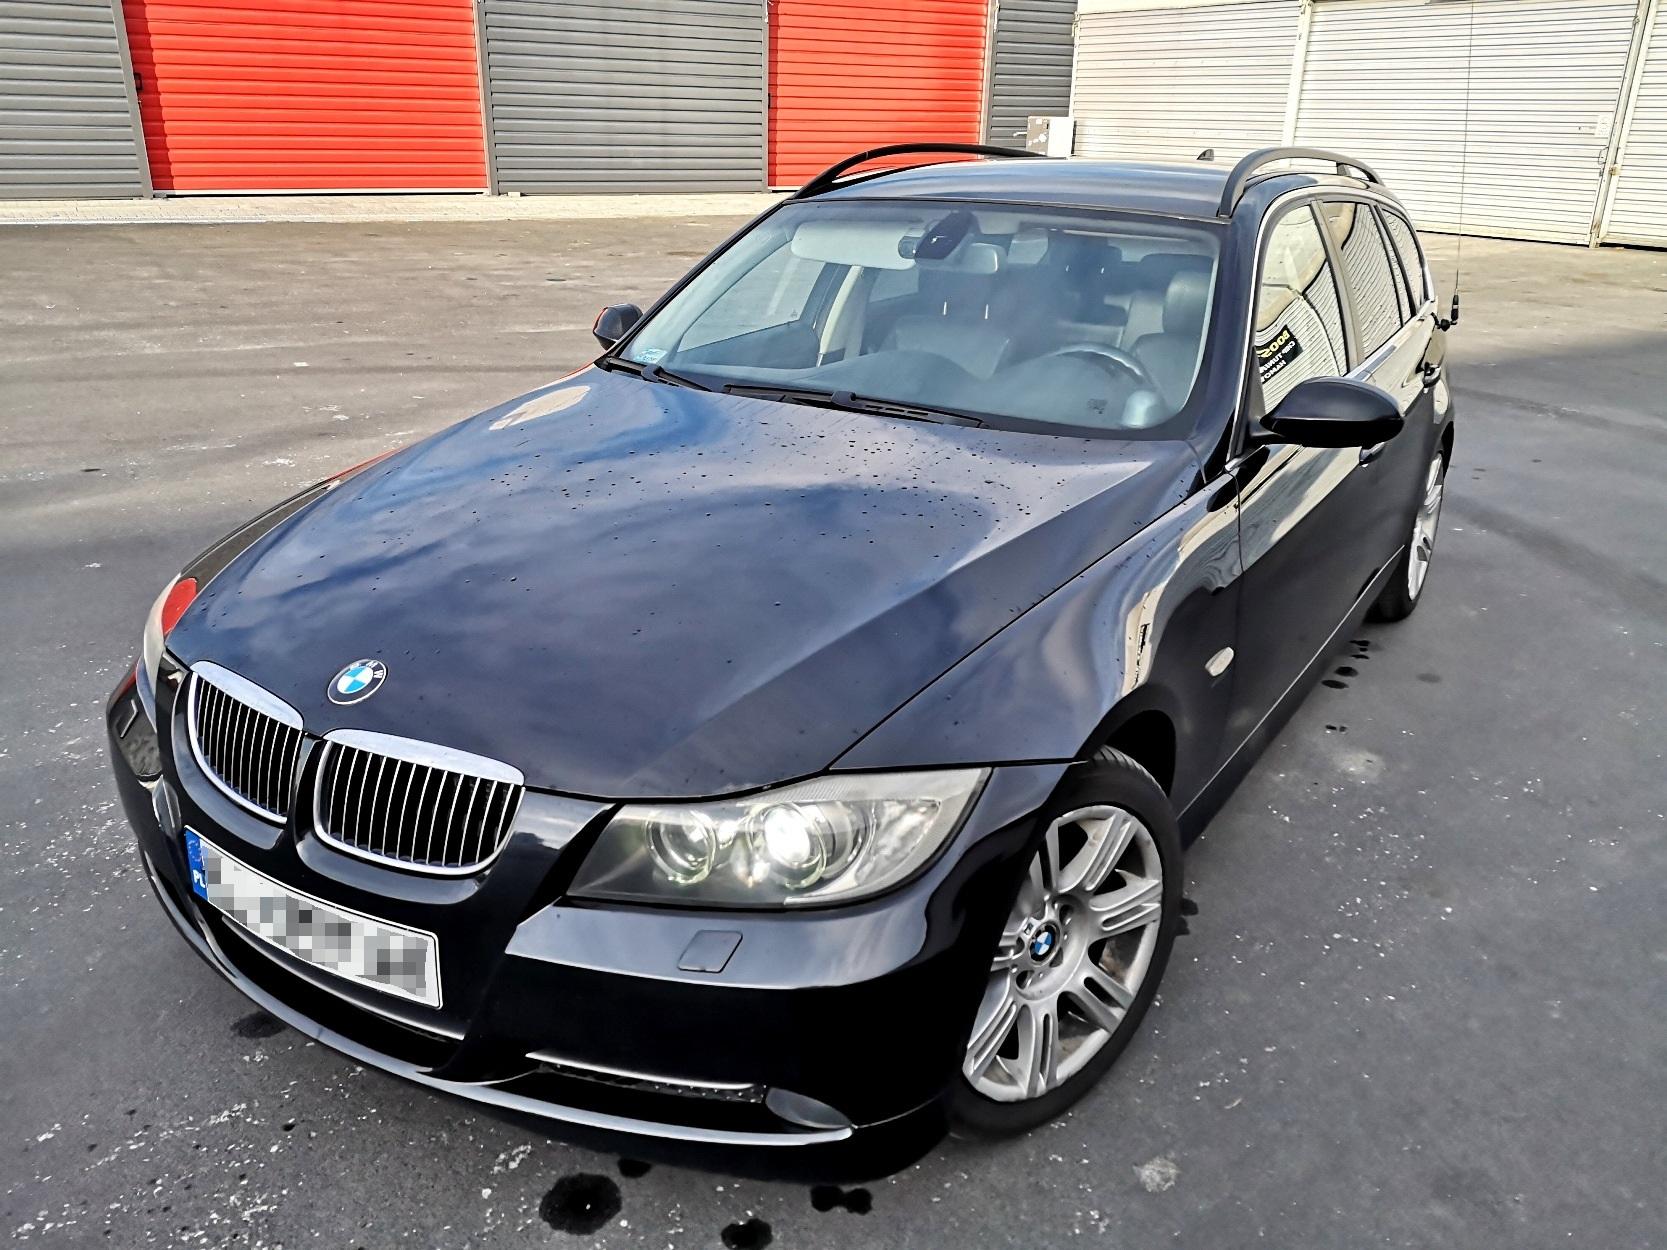 BMW E91 M57N2 231KM >> 393KM 862Nm